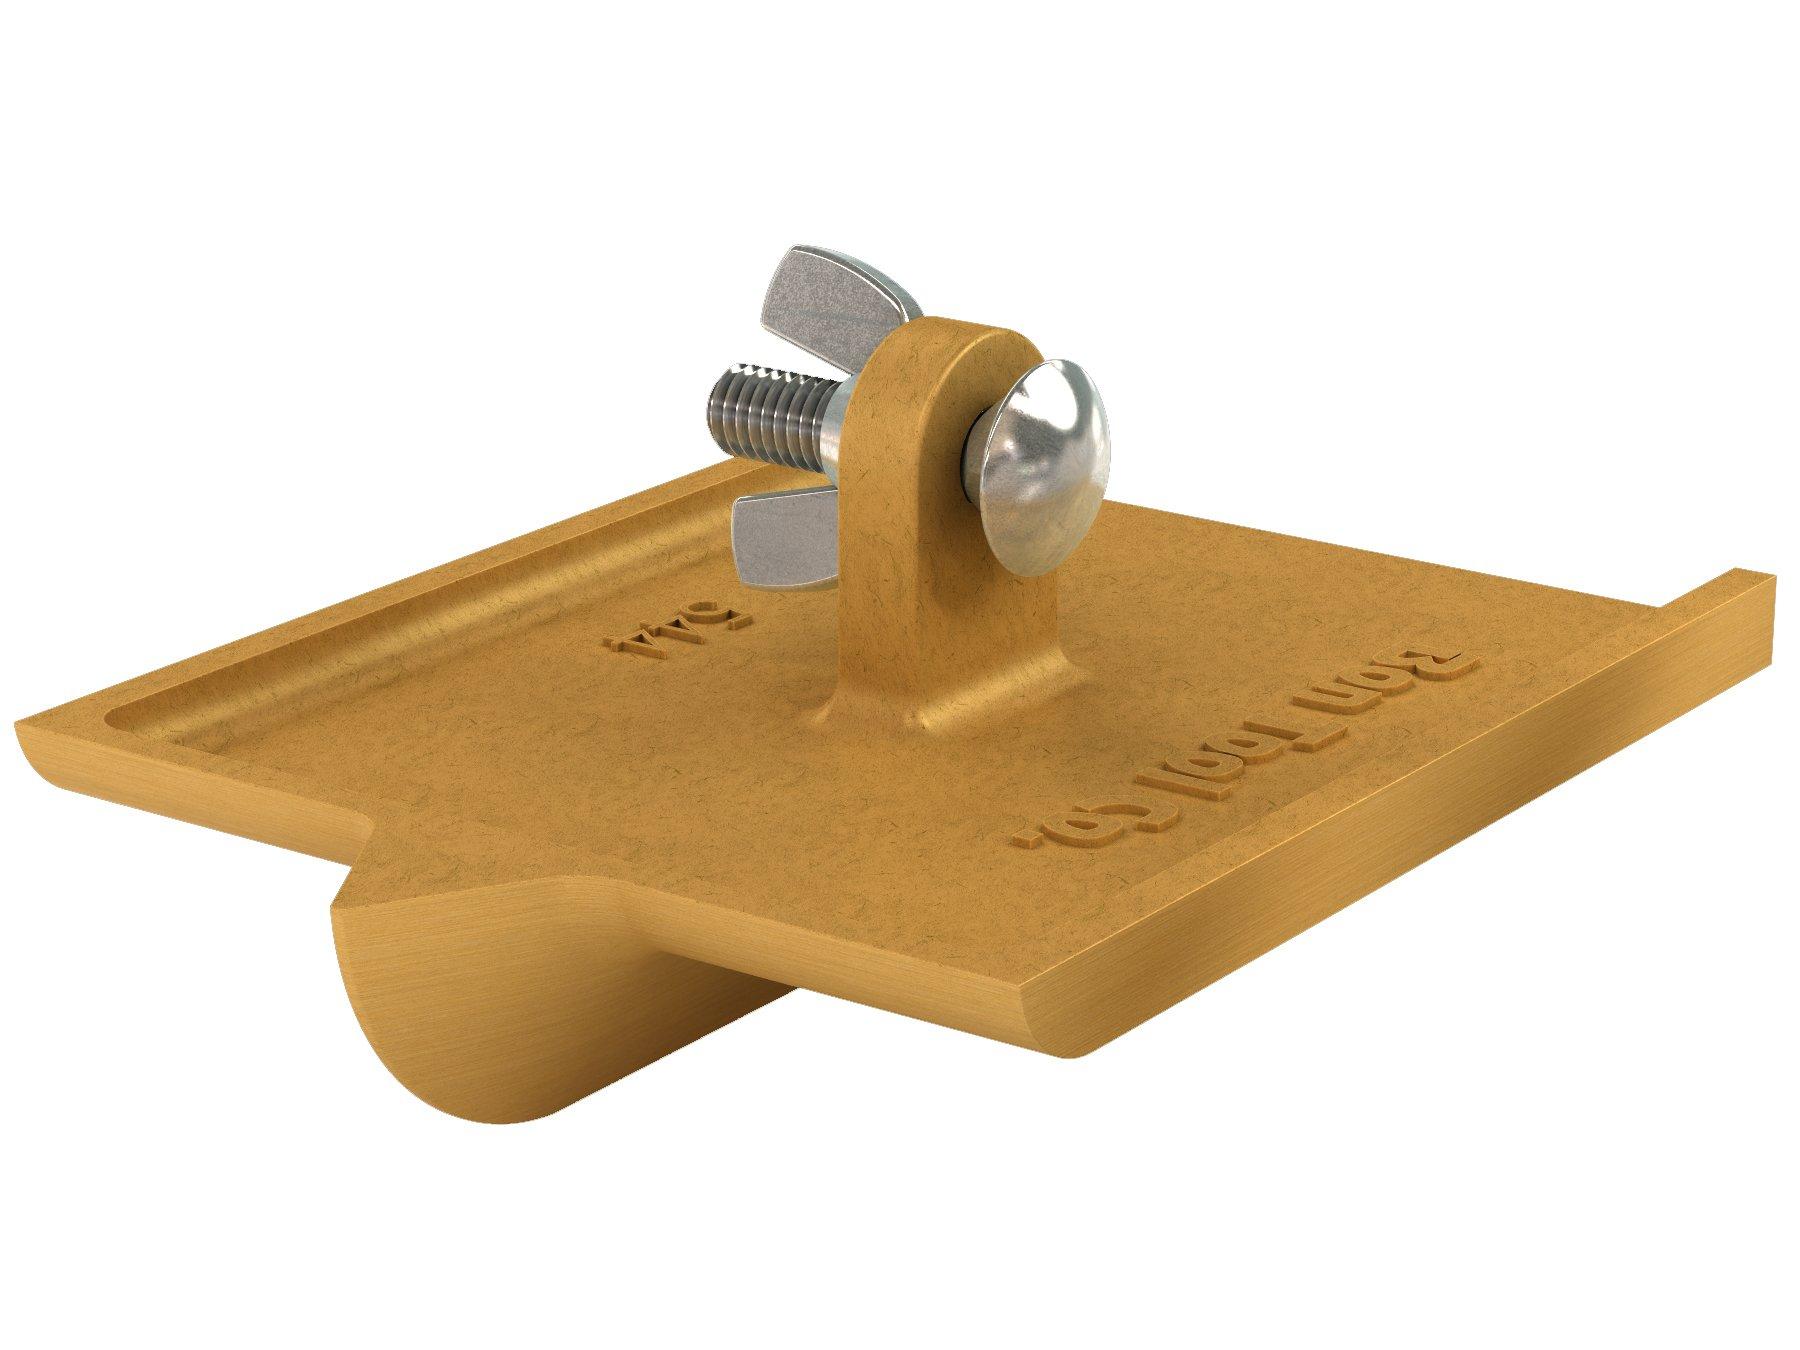 Bon 12-544 6-Inch by 4-1/2-Inch Bronze Walking Concrete Groover, 3/4-Inch Bit Depth, 7/8-Inch Bit Width